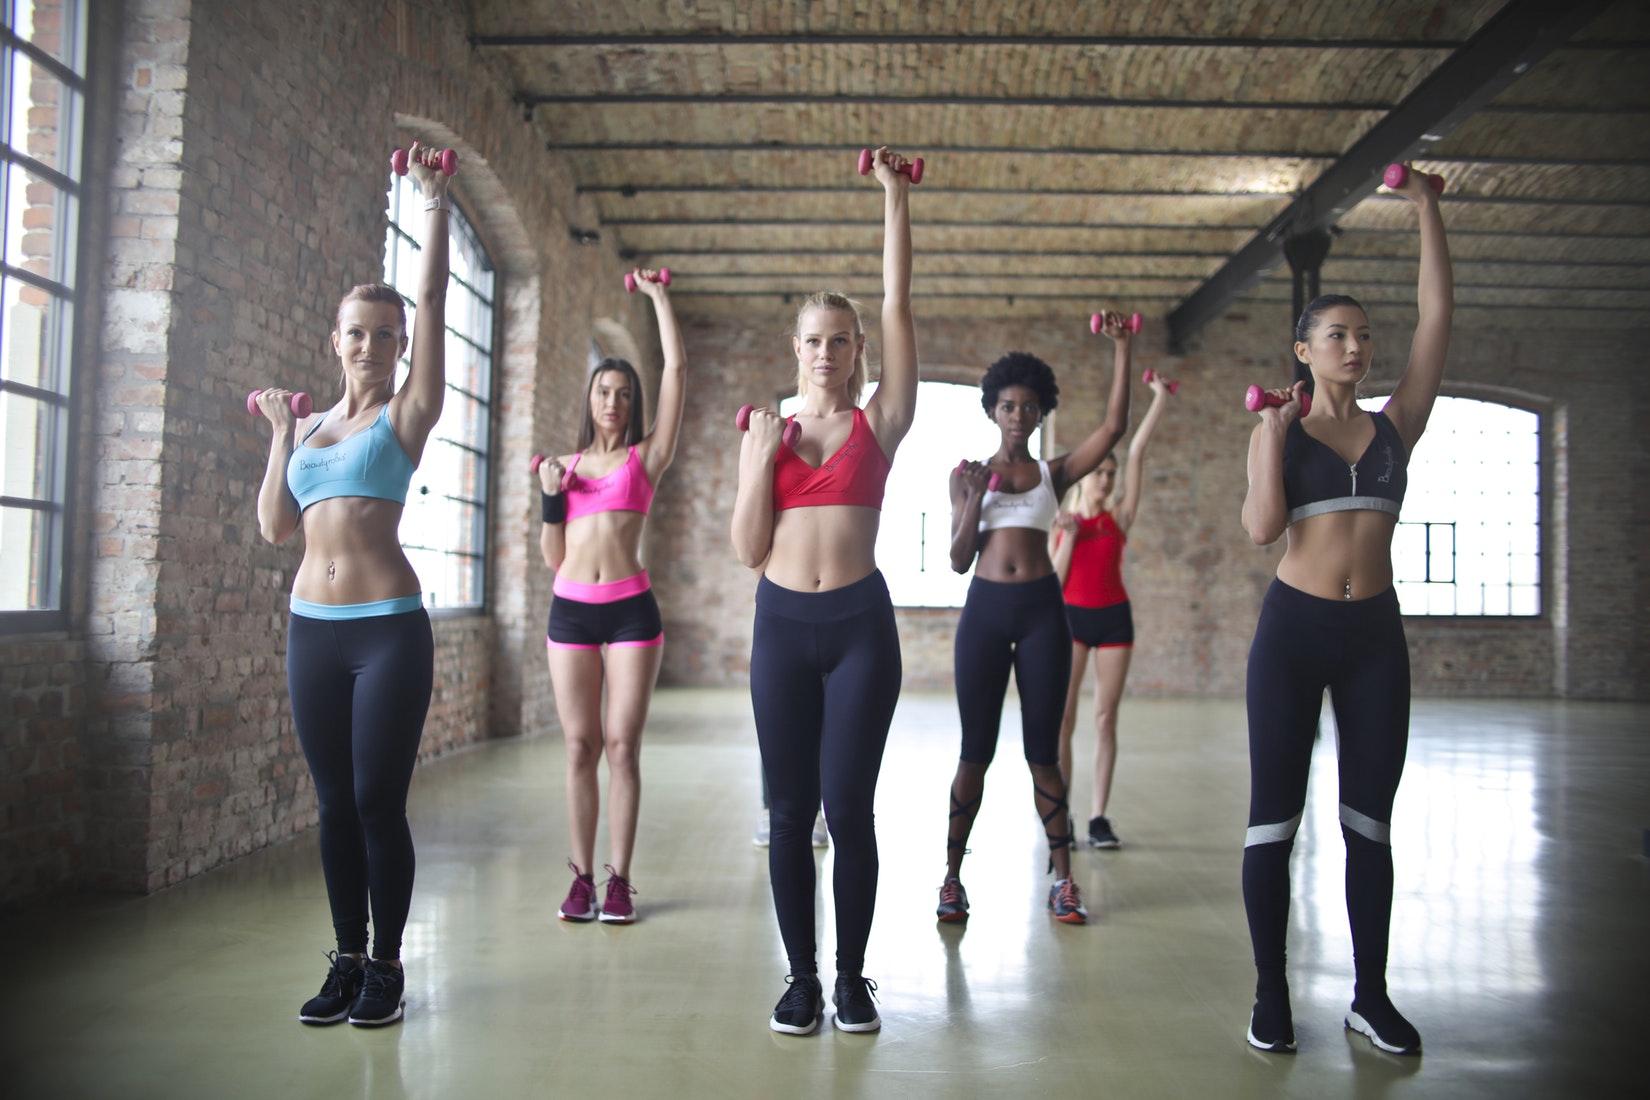 Femmes sportive